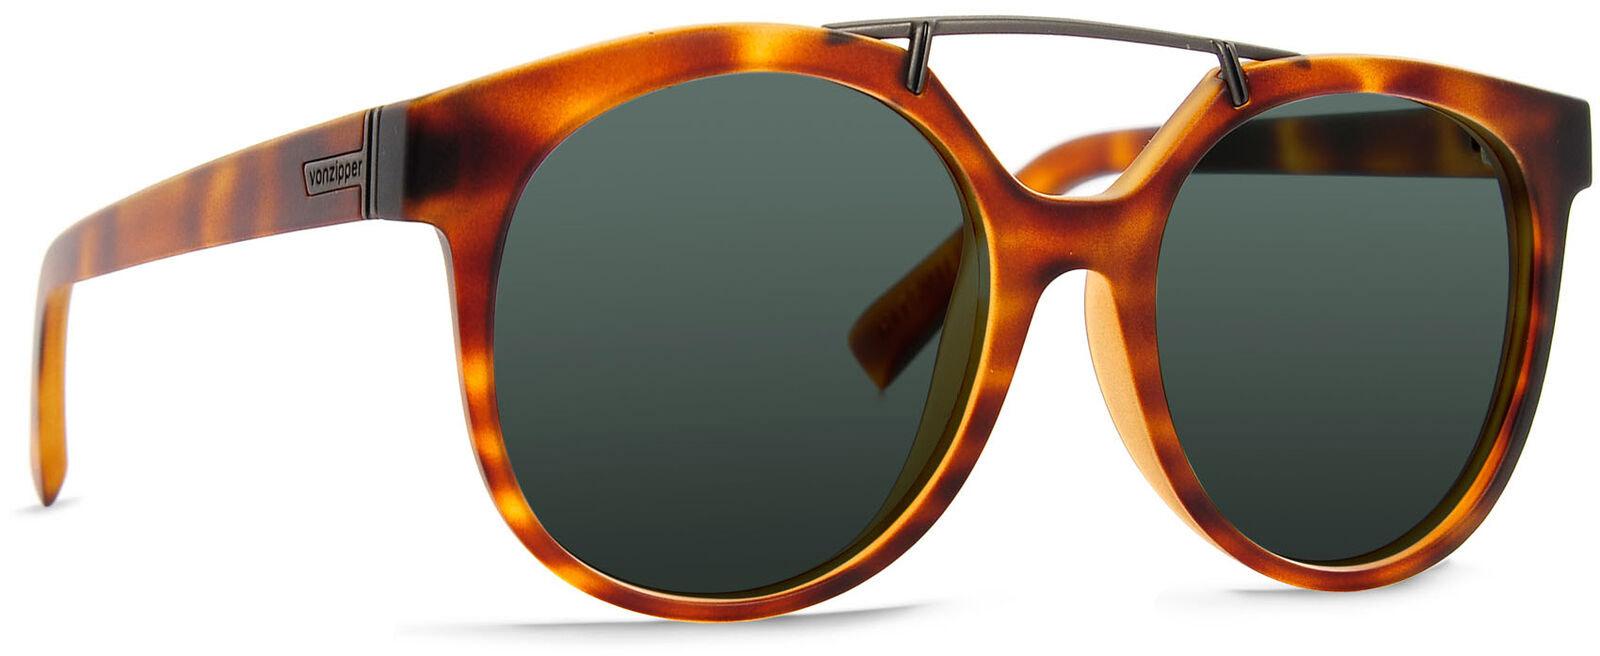 Von Zipper Hitsville Vintage Grey Lens Sunglasses, Tortoise Satin